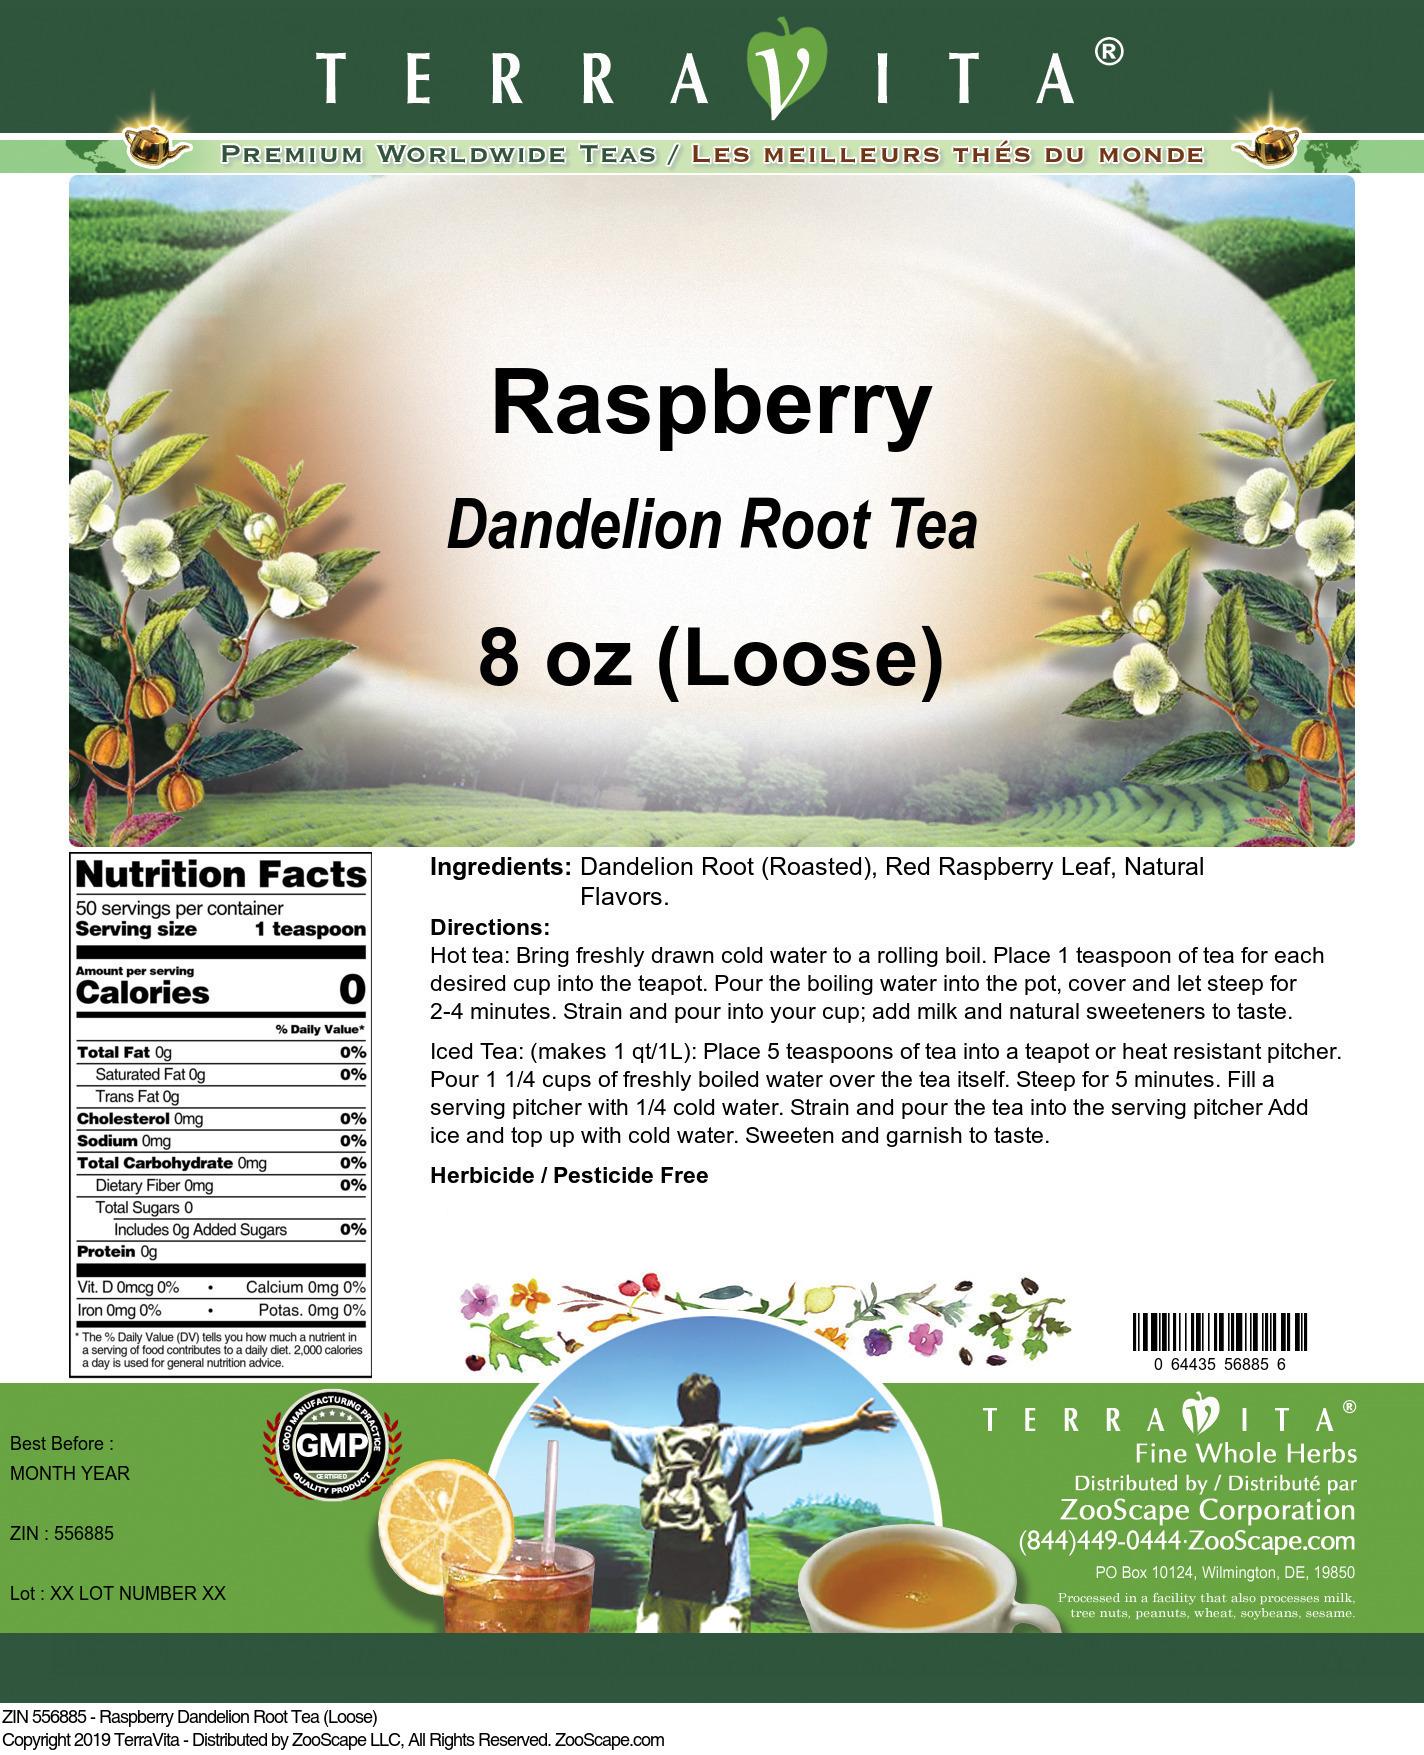 Raspberry Dandelion Root Tea (Loose)